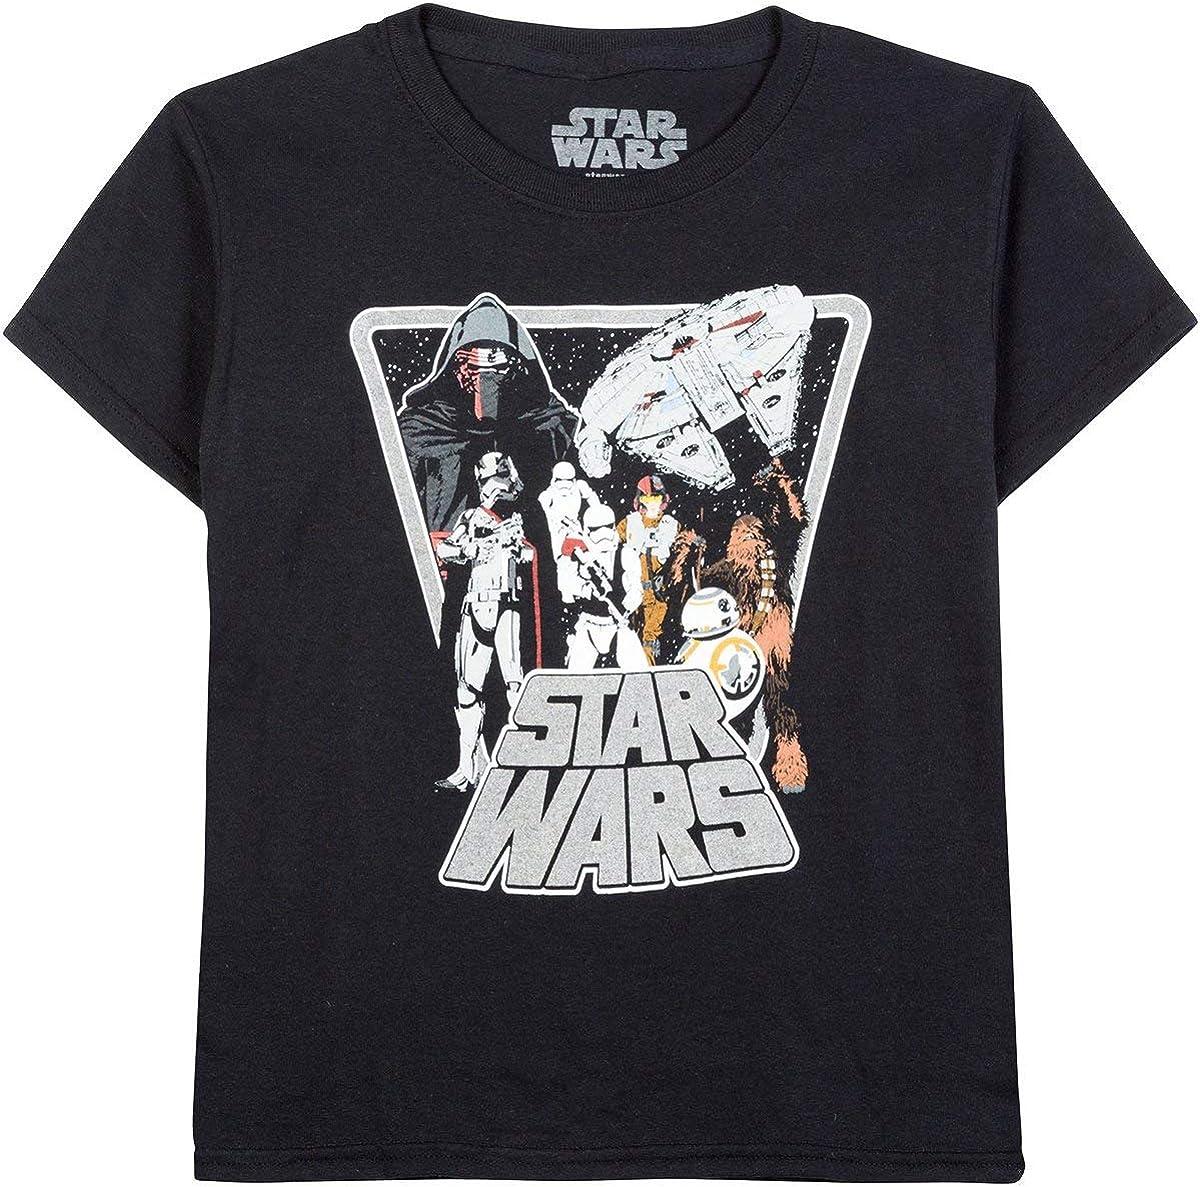 Star Wars Vintage Look Boys Shirt 4-16